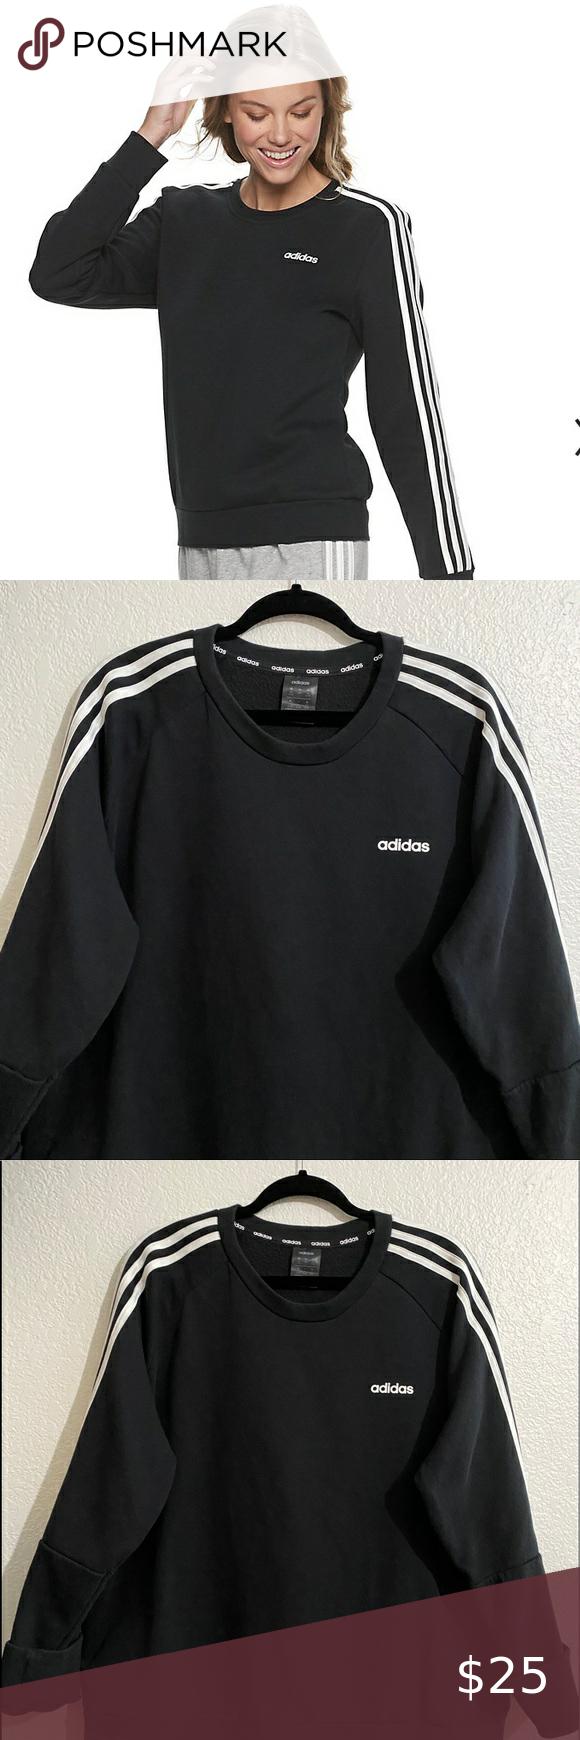 Adidas 3 Stripe Fleece Crew Neck Sweatshirt Grey Adidas Hoodie Adidas Cropped Hoodie Crew Neck Sweatshirt [ 1740 x 580 Pixel ]